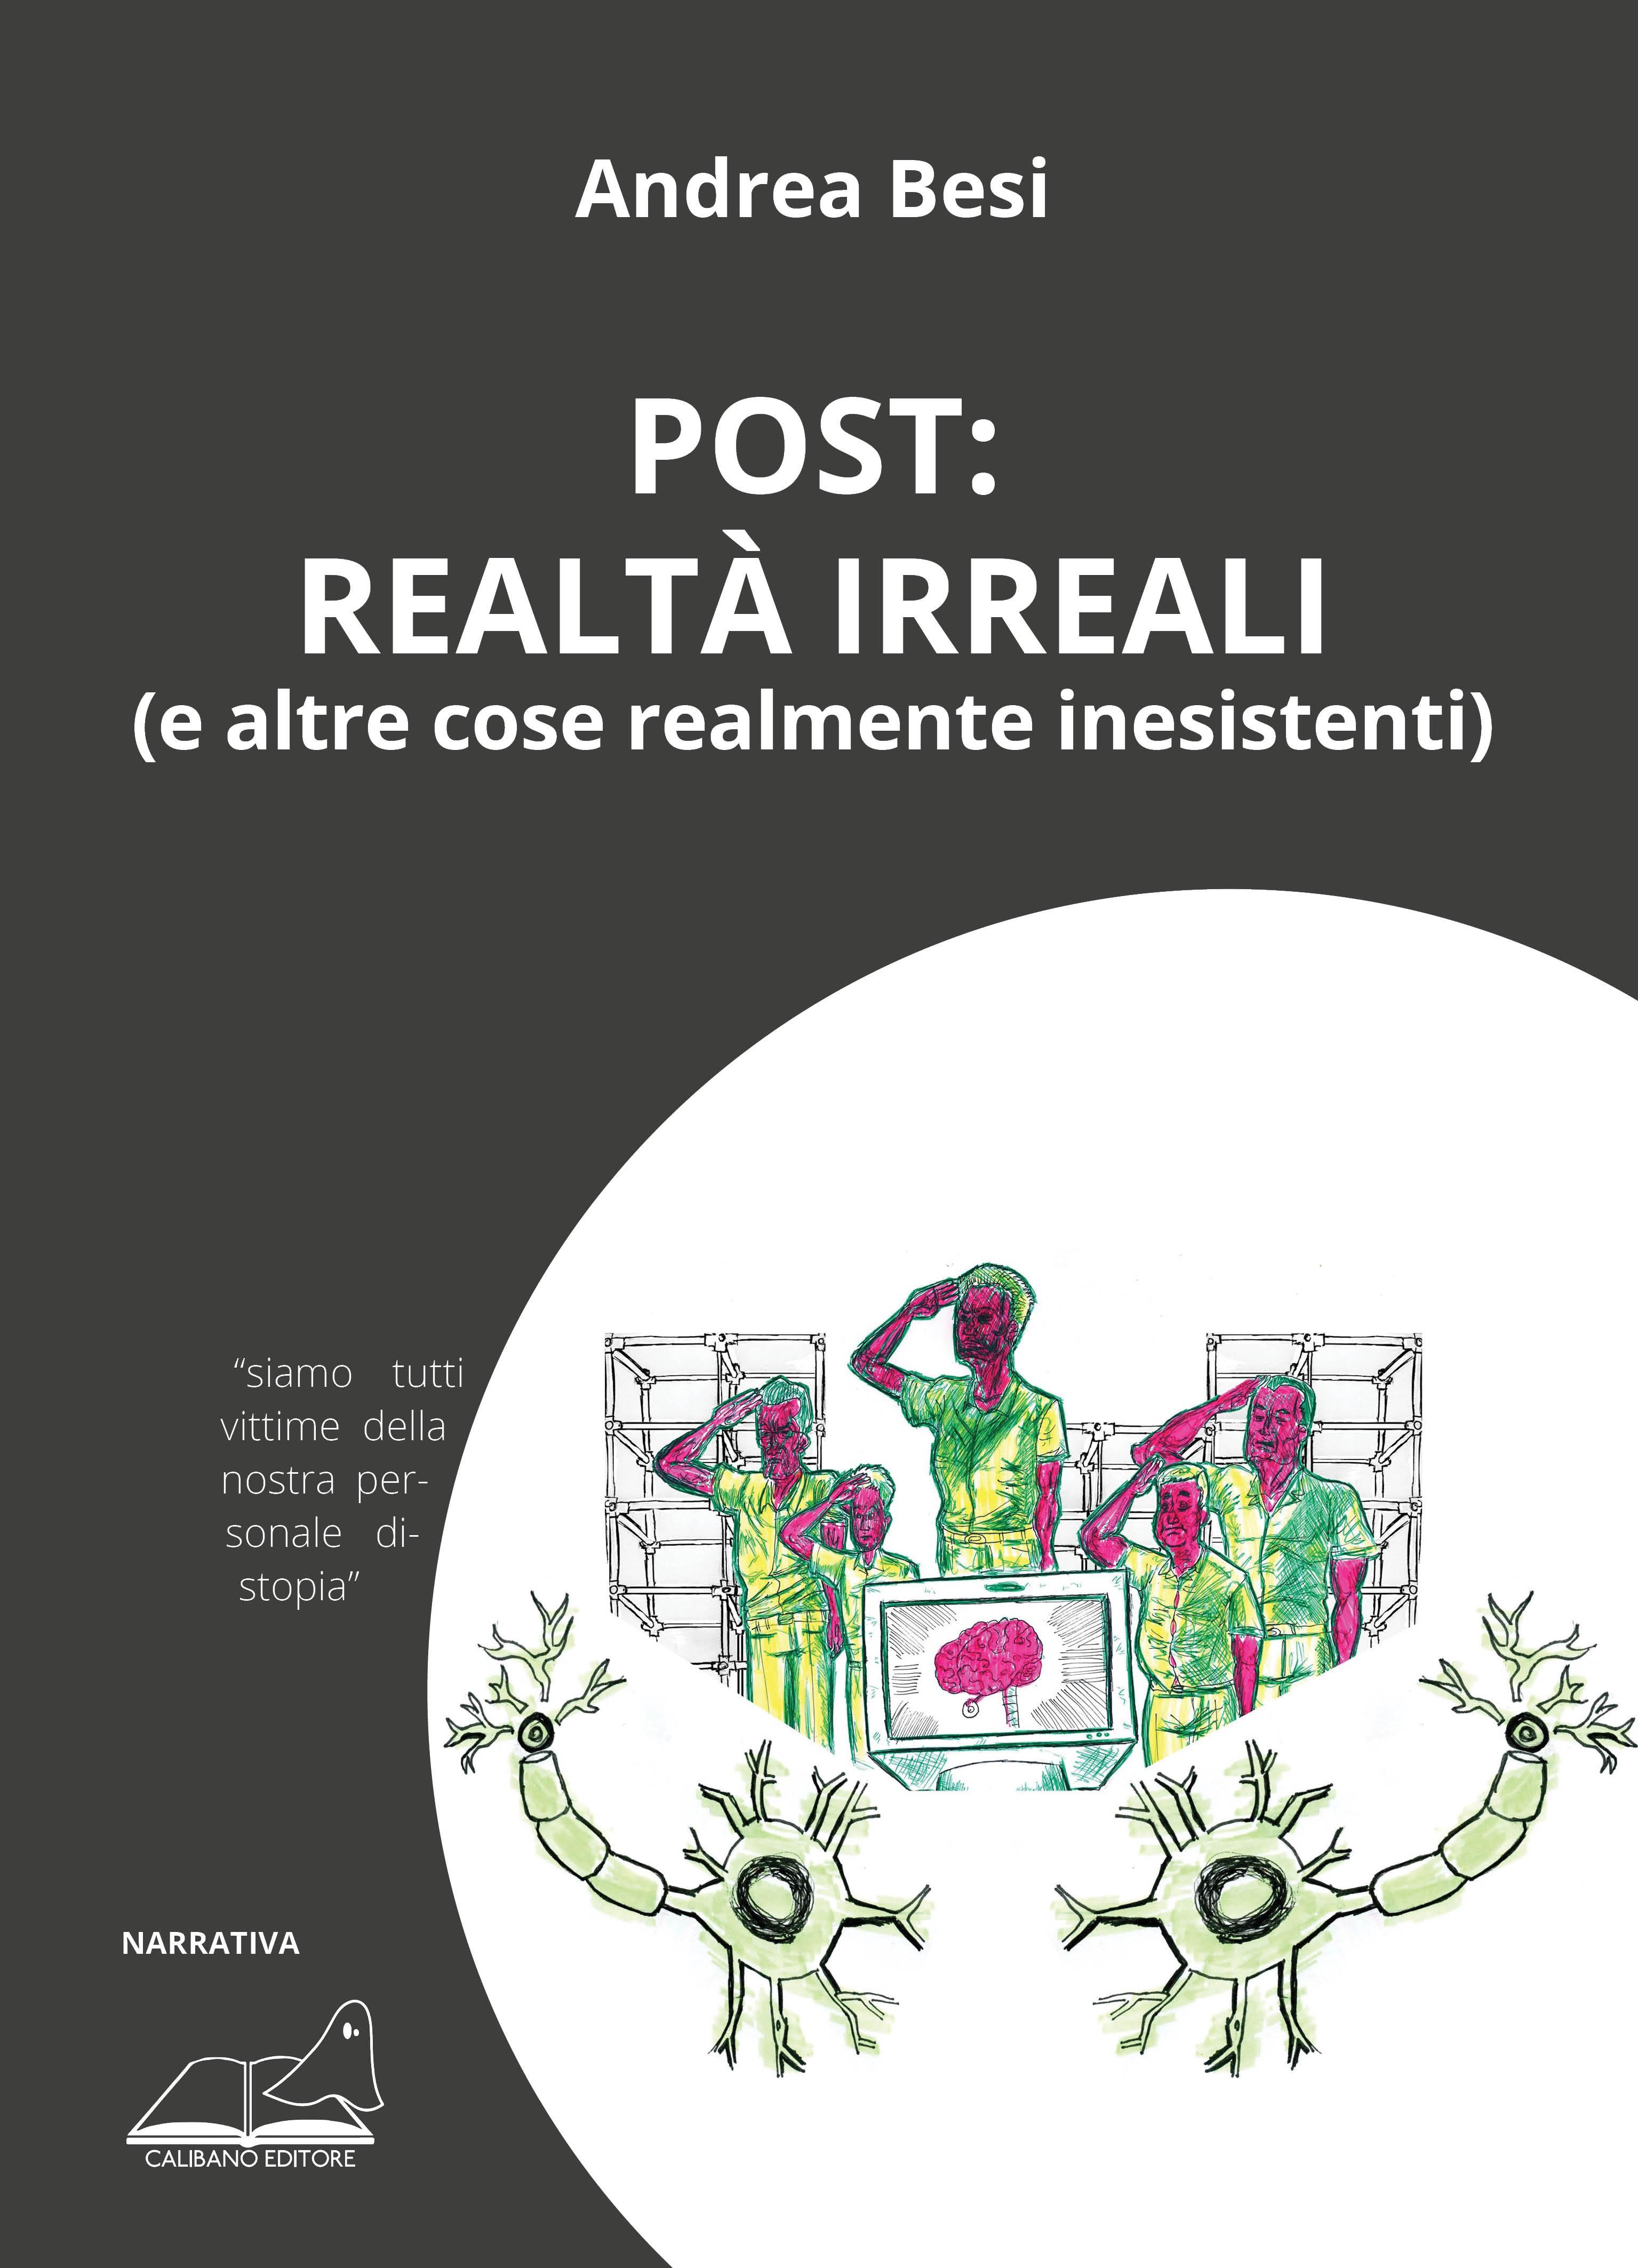 Post: realtà irreali-image-1%>